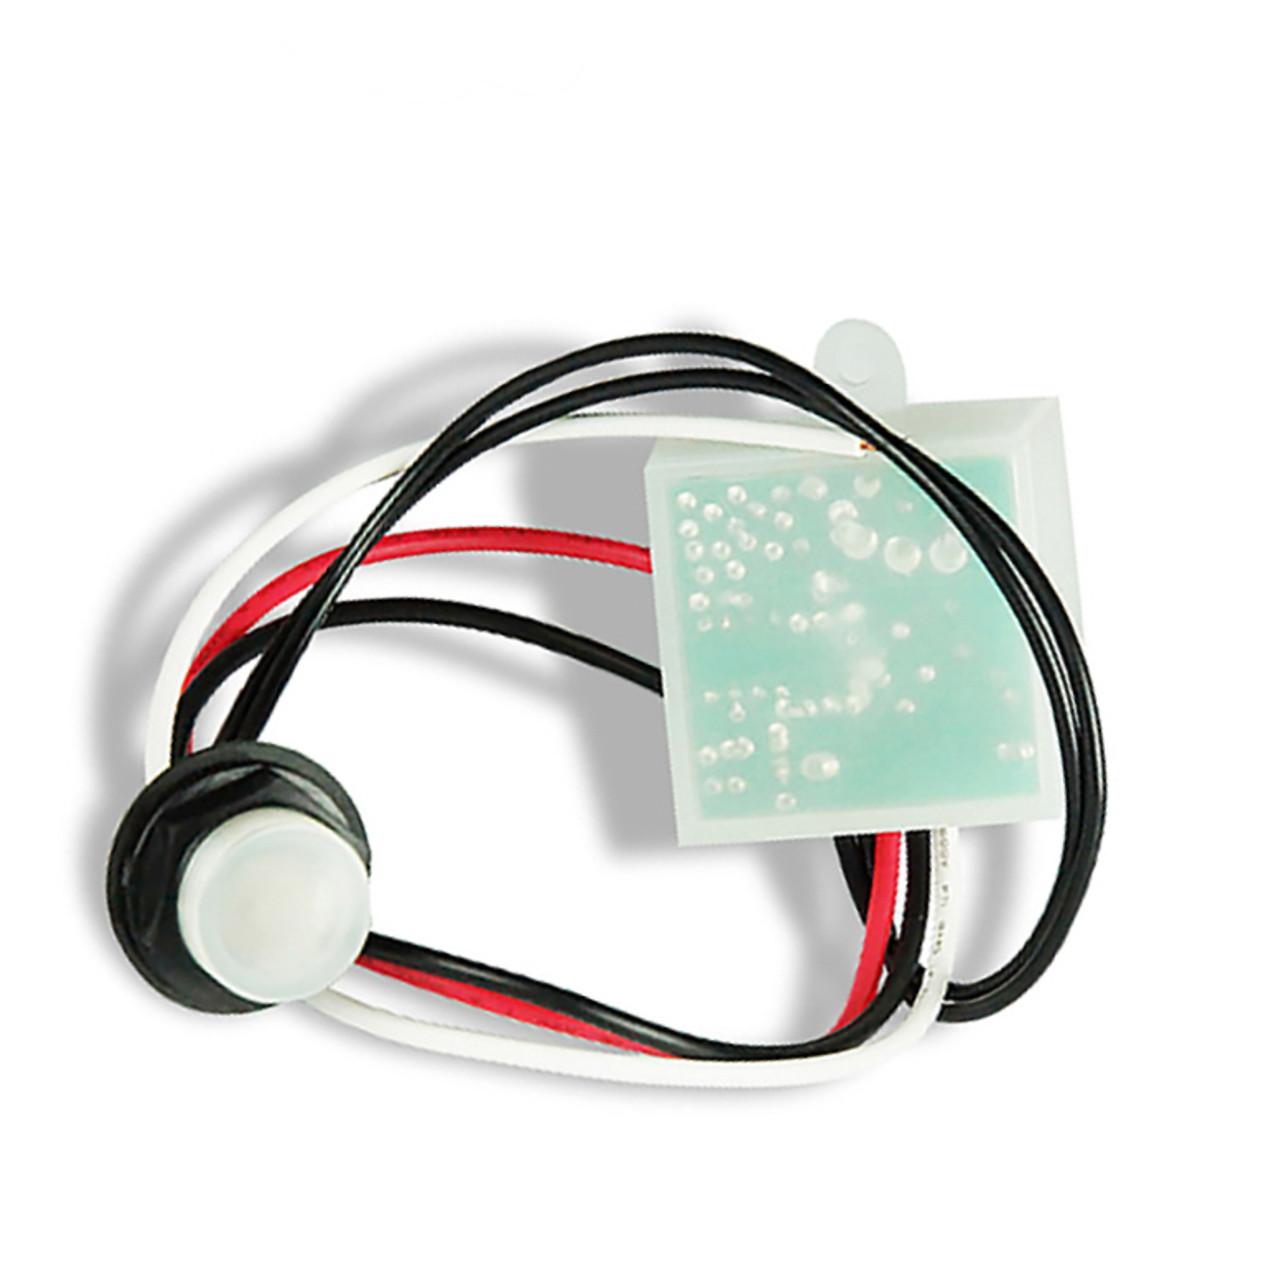 12v photocell sensor switch for photocontrol of 12v lights  dust-to-dawn  sensor